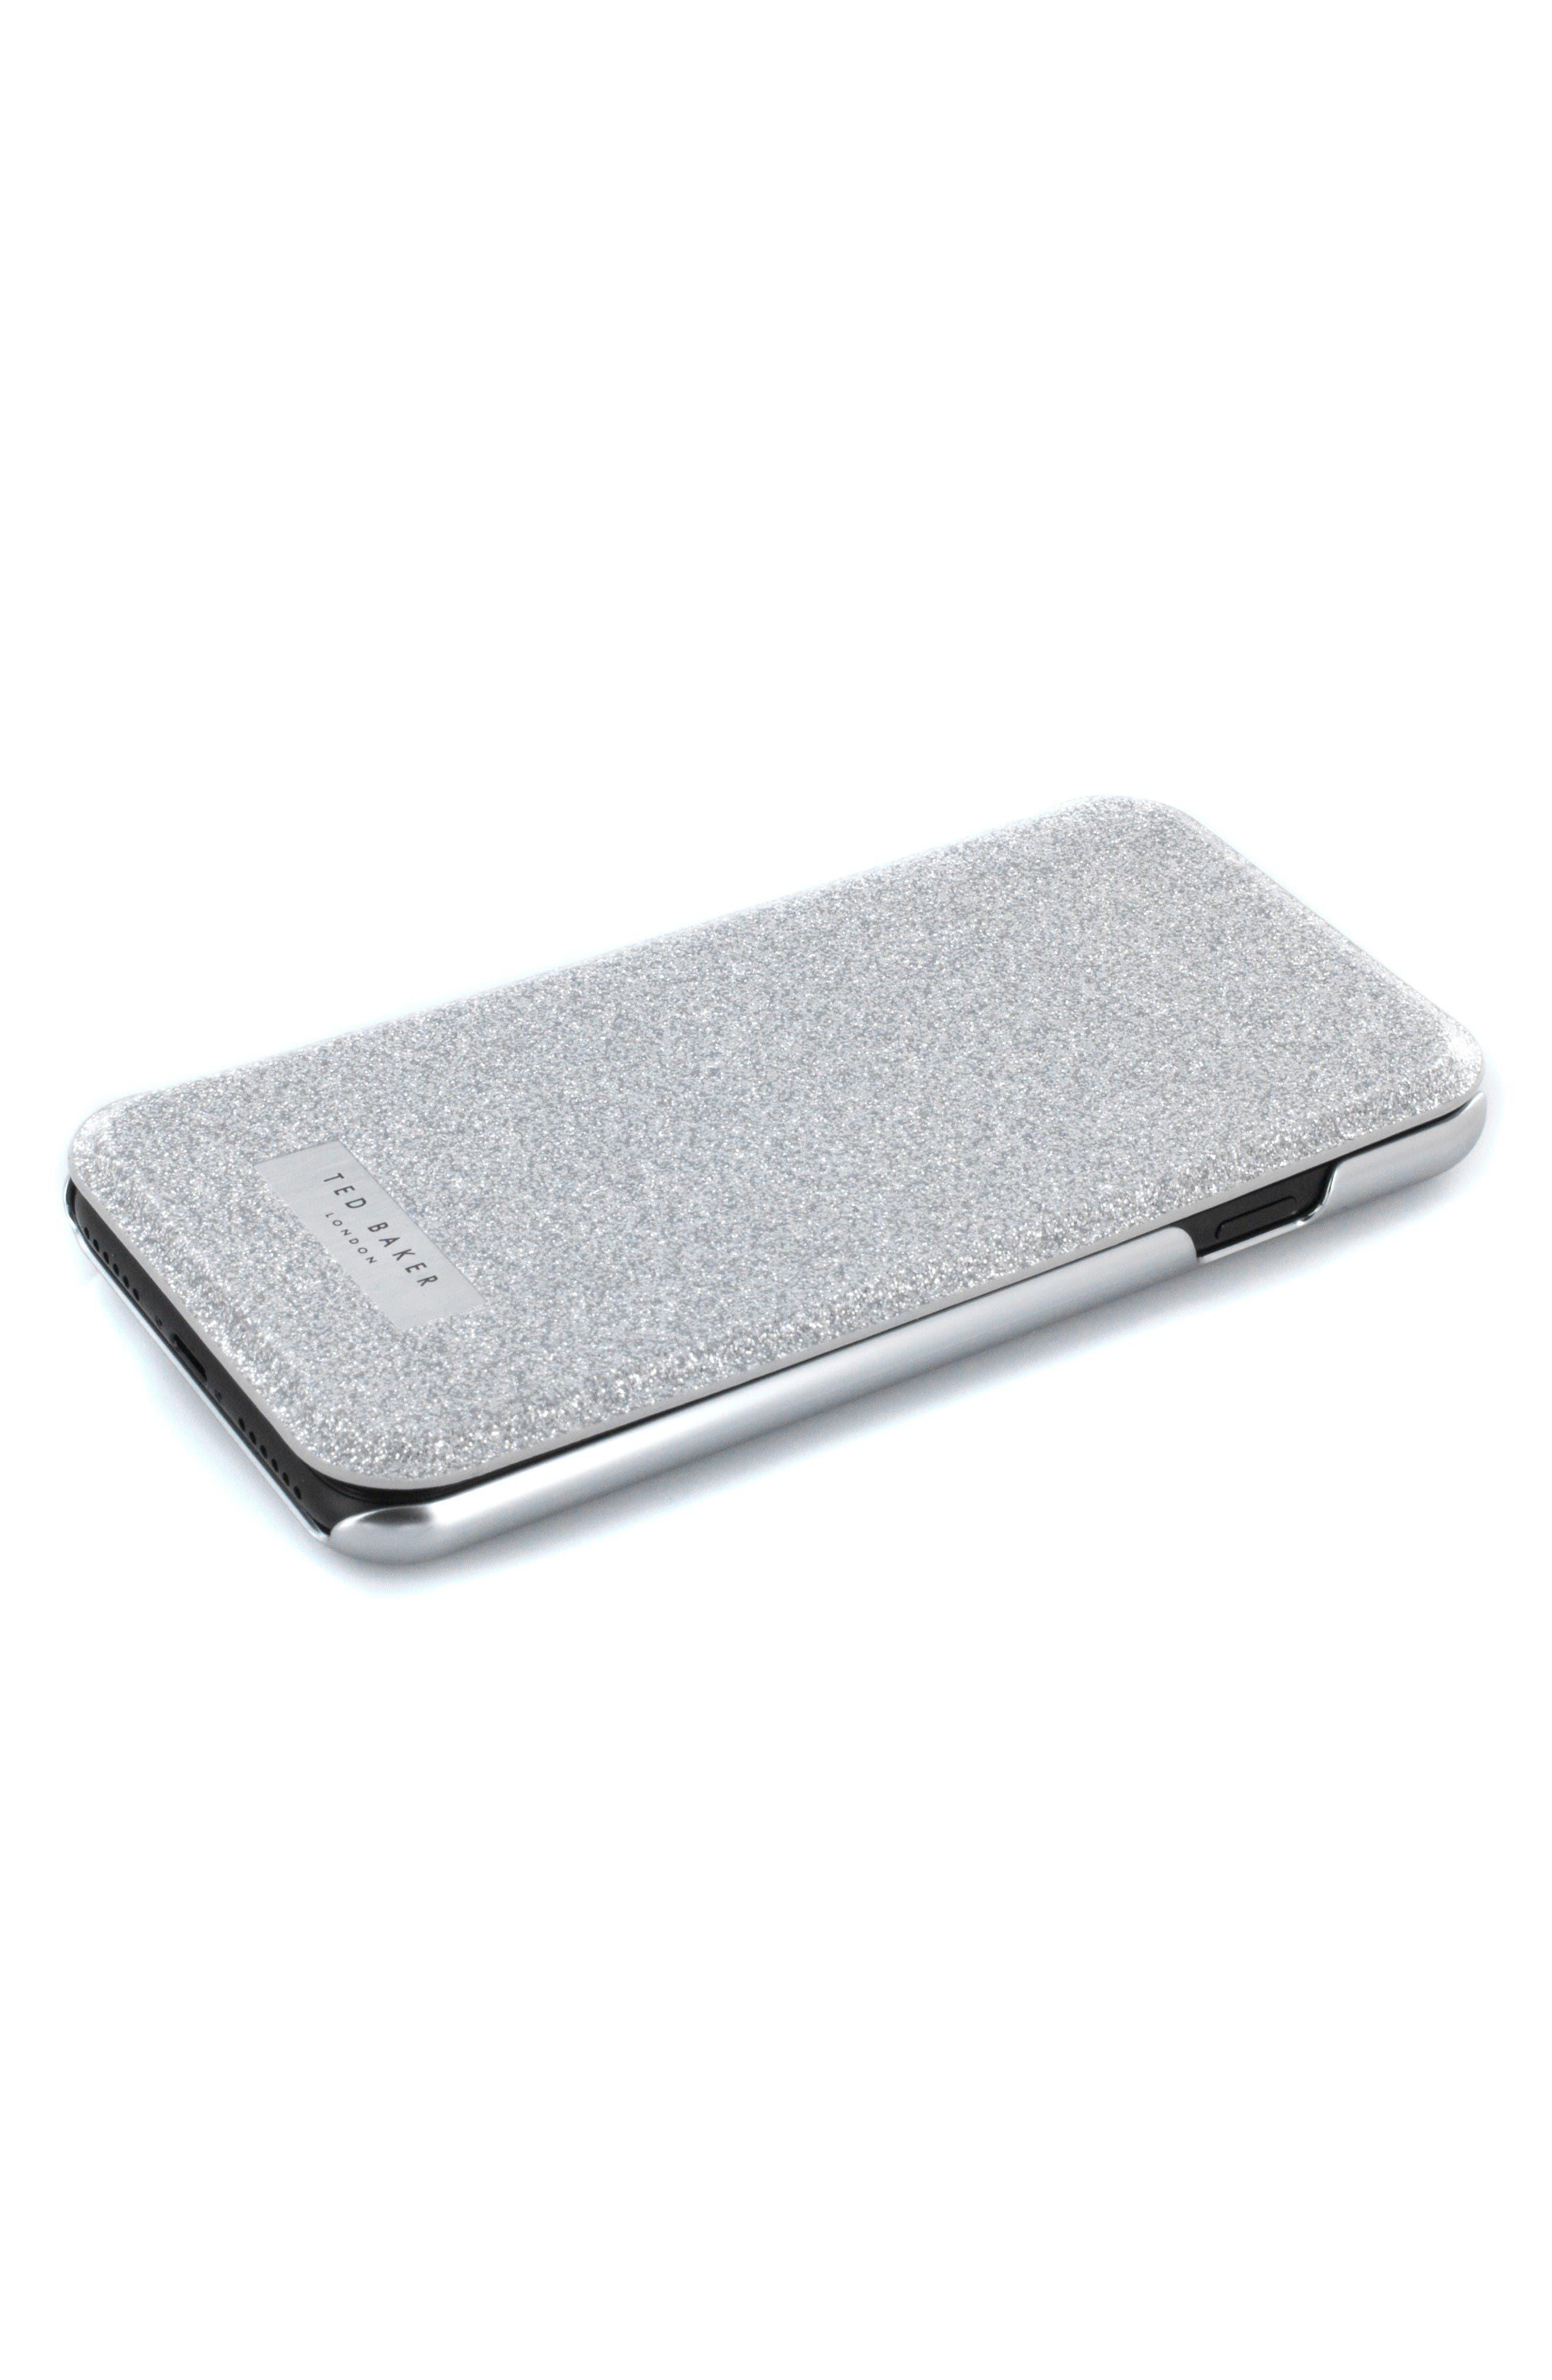 Glitsie iPhone 6/6s/7/8 Mirror Folio Case,                             Alternate thumbnail 6, color,                             Silver